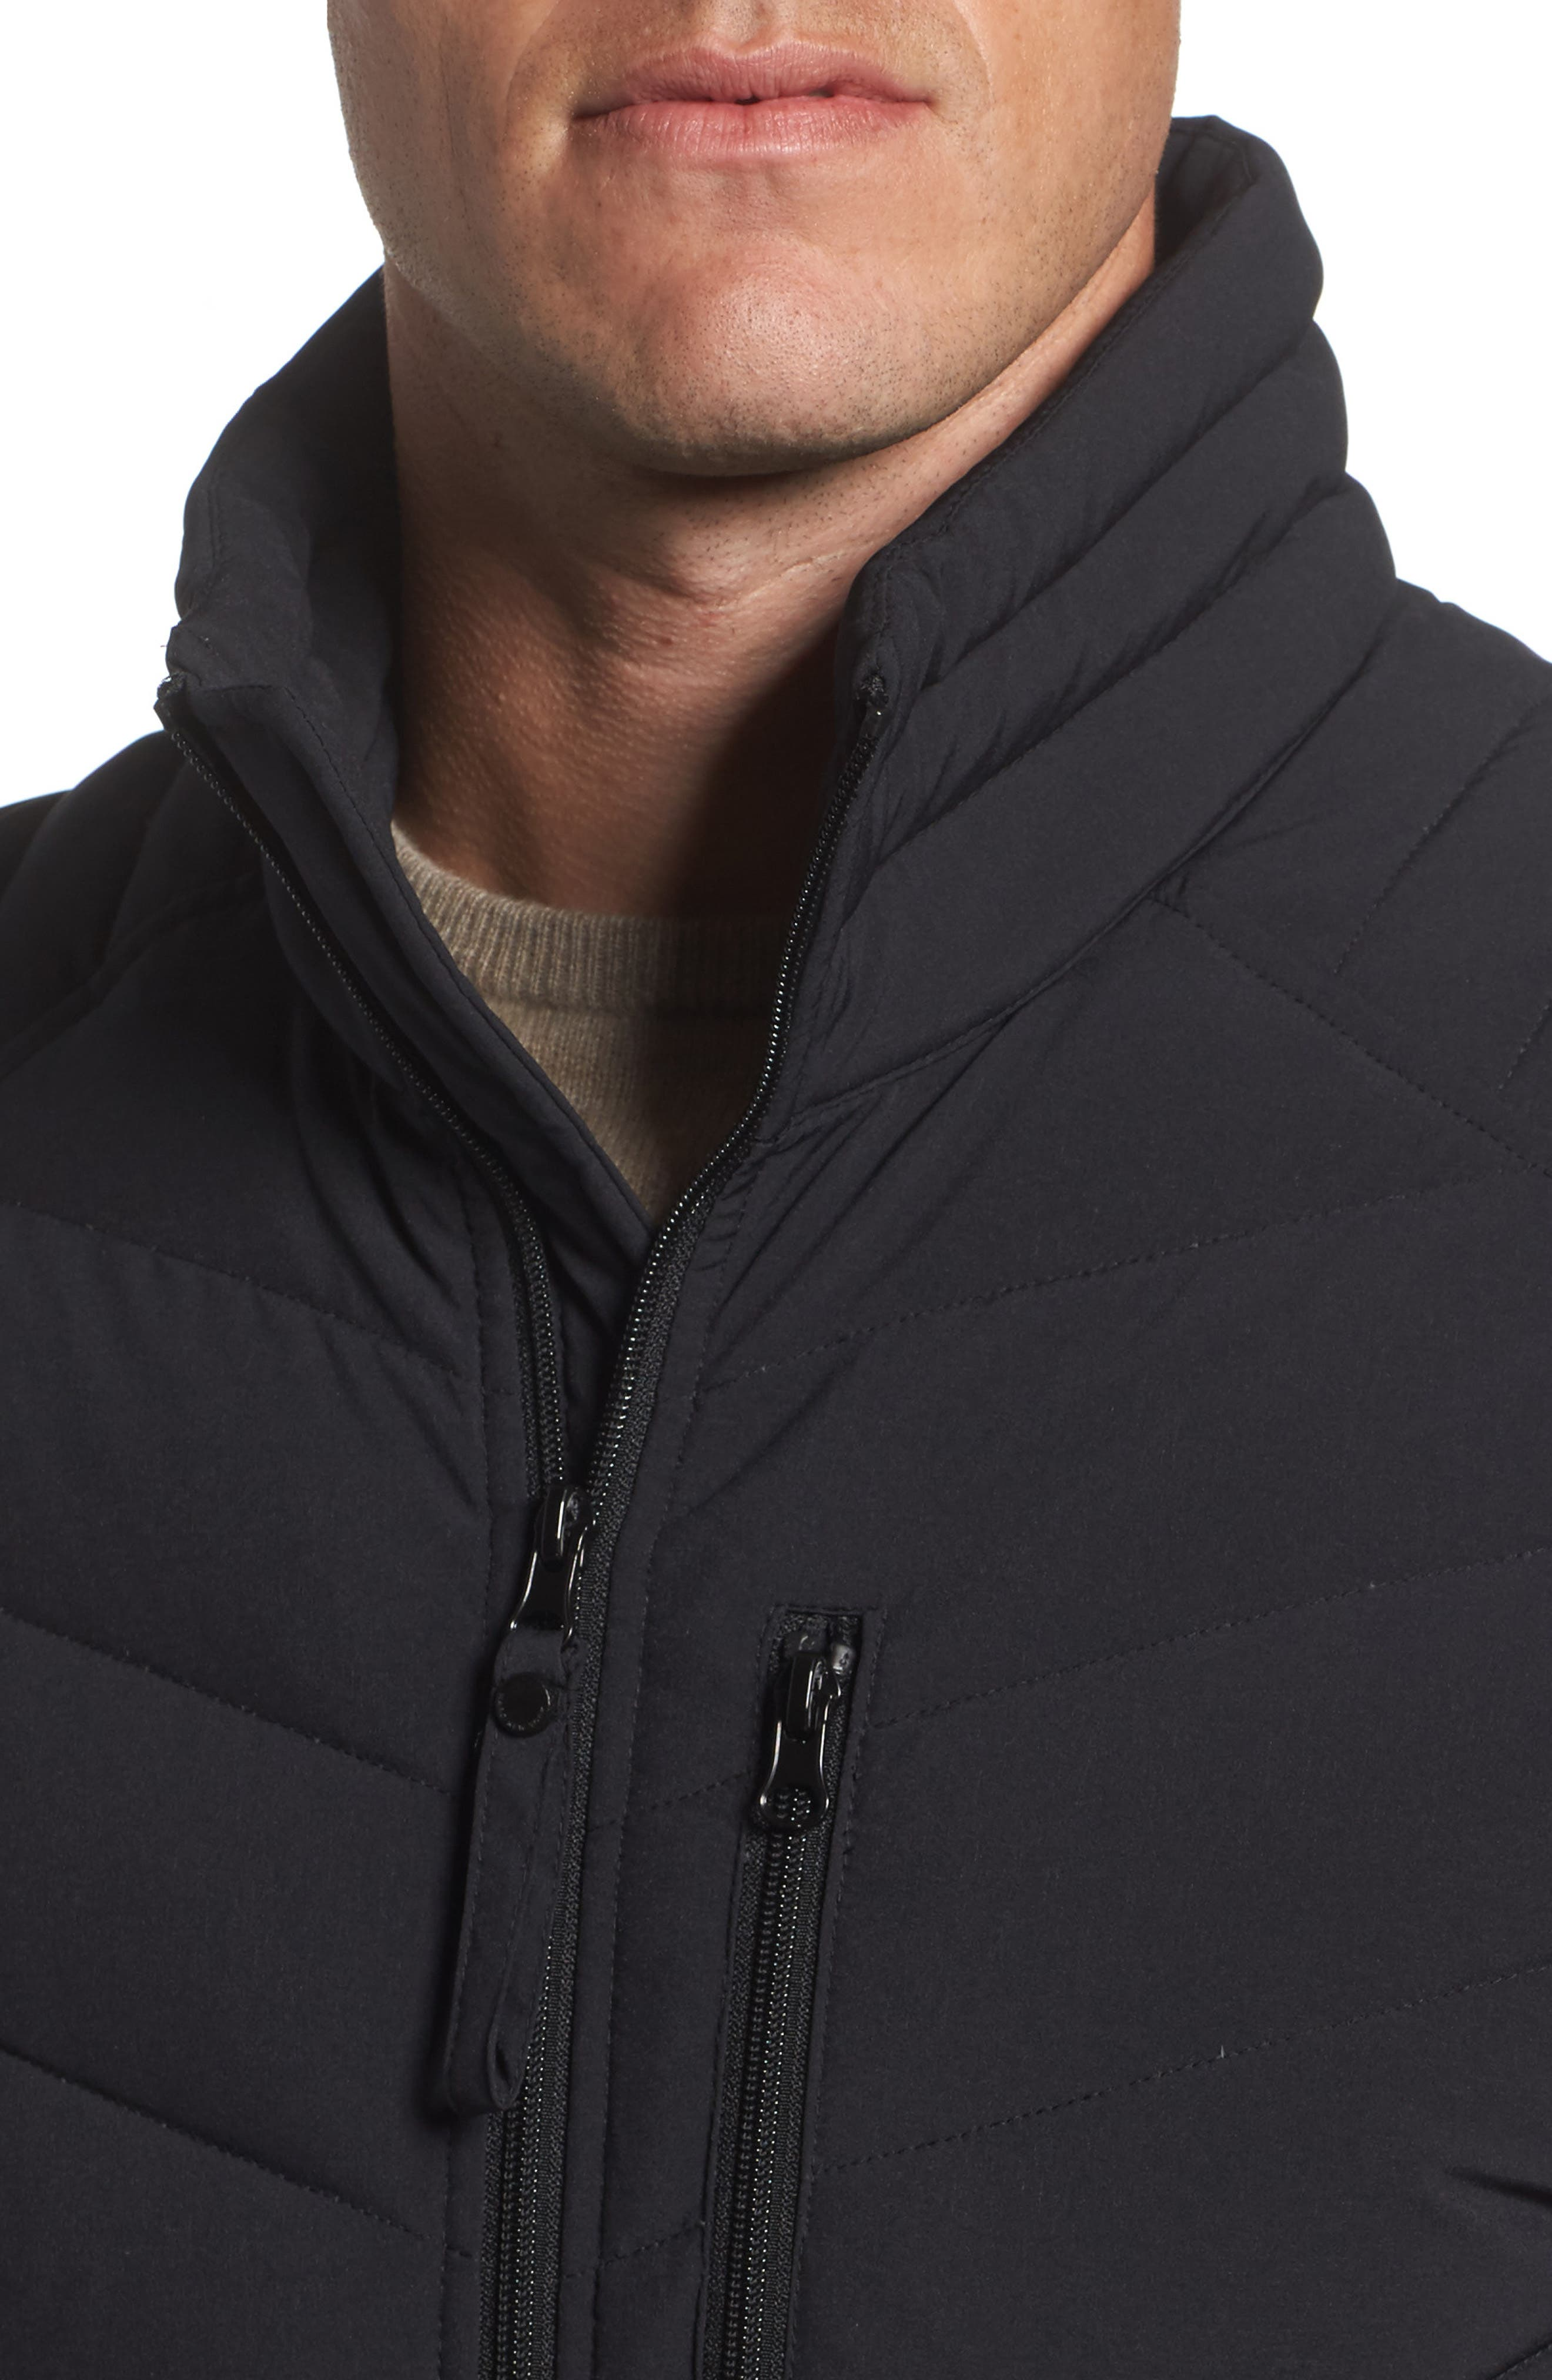 Stretch Packable Down Jacket,                             Alternate thumbnail 4, color,                             001